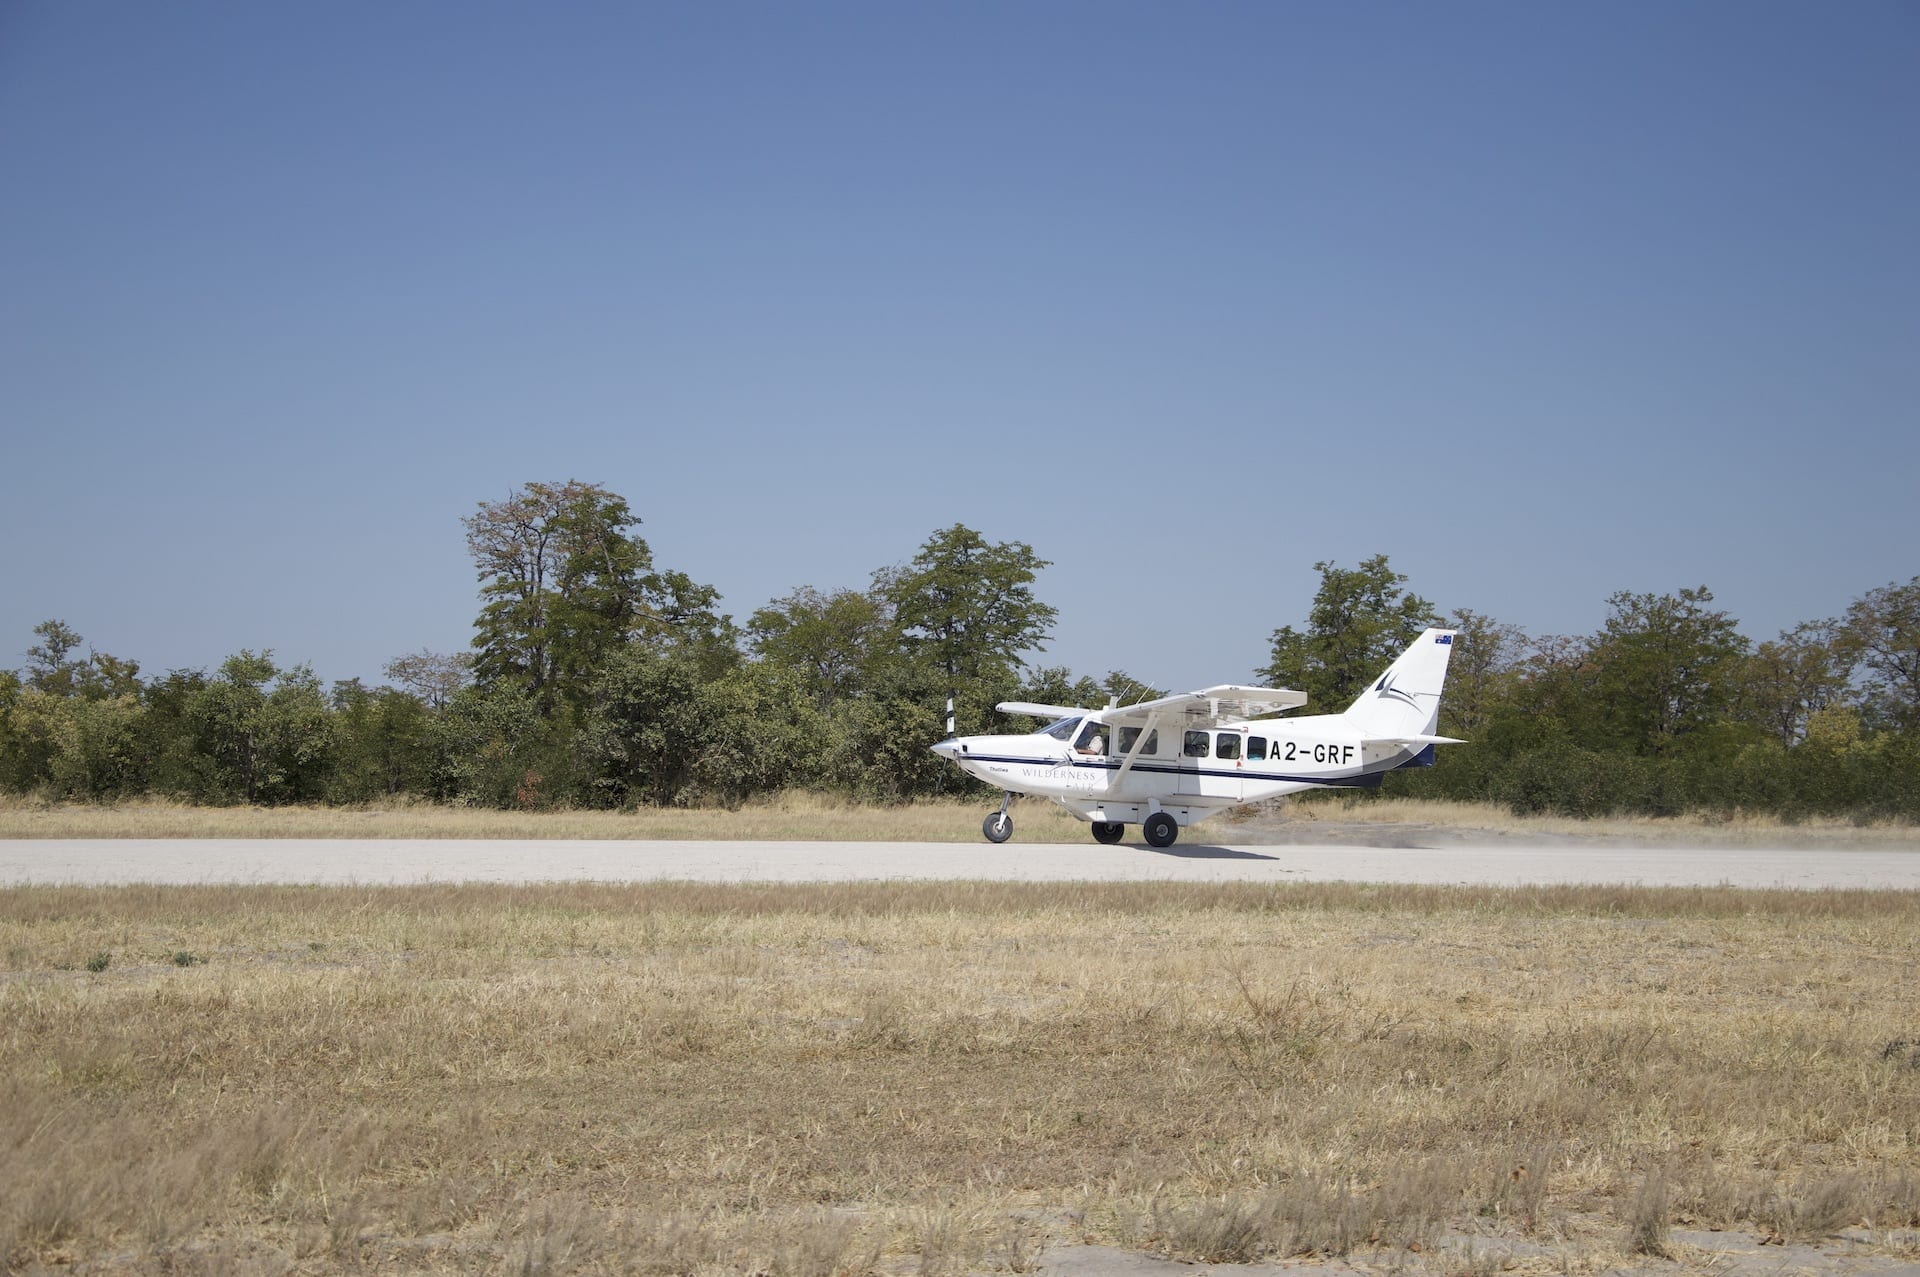 Algemeen - BW - safari - vliegtuig kopie